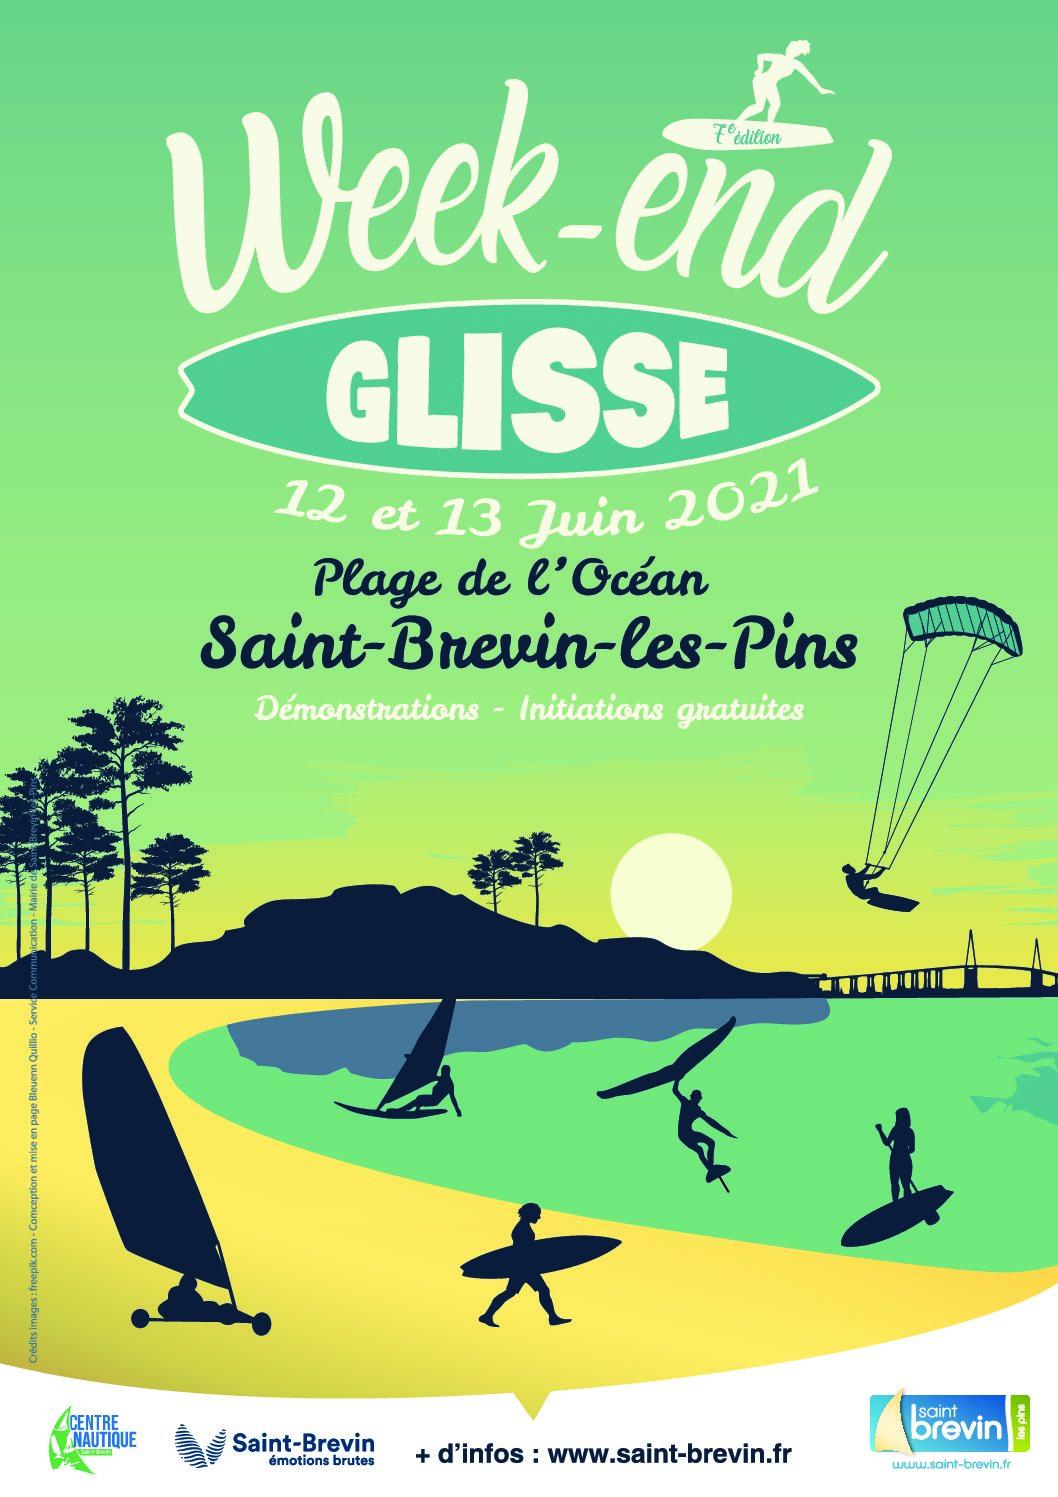 WEEK END GLISSE 2021 – Saint Brévin